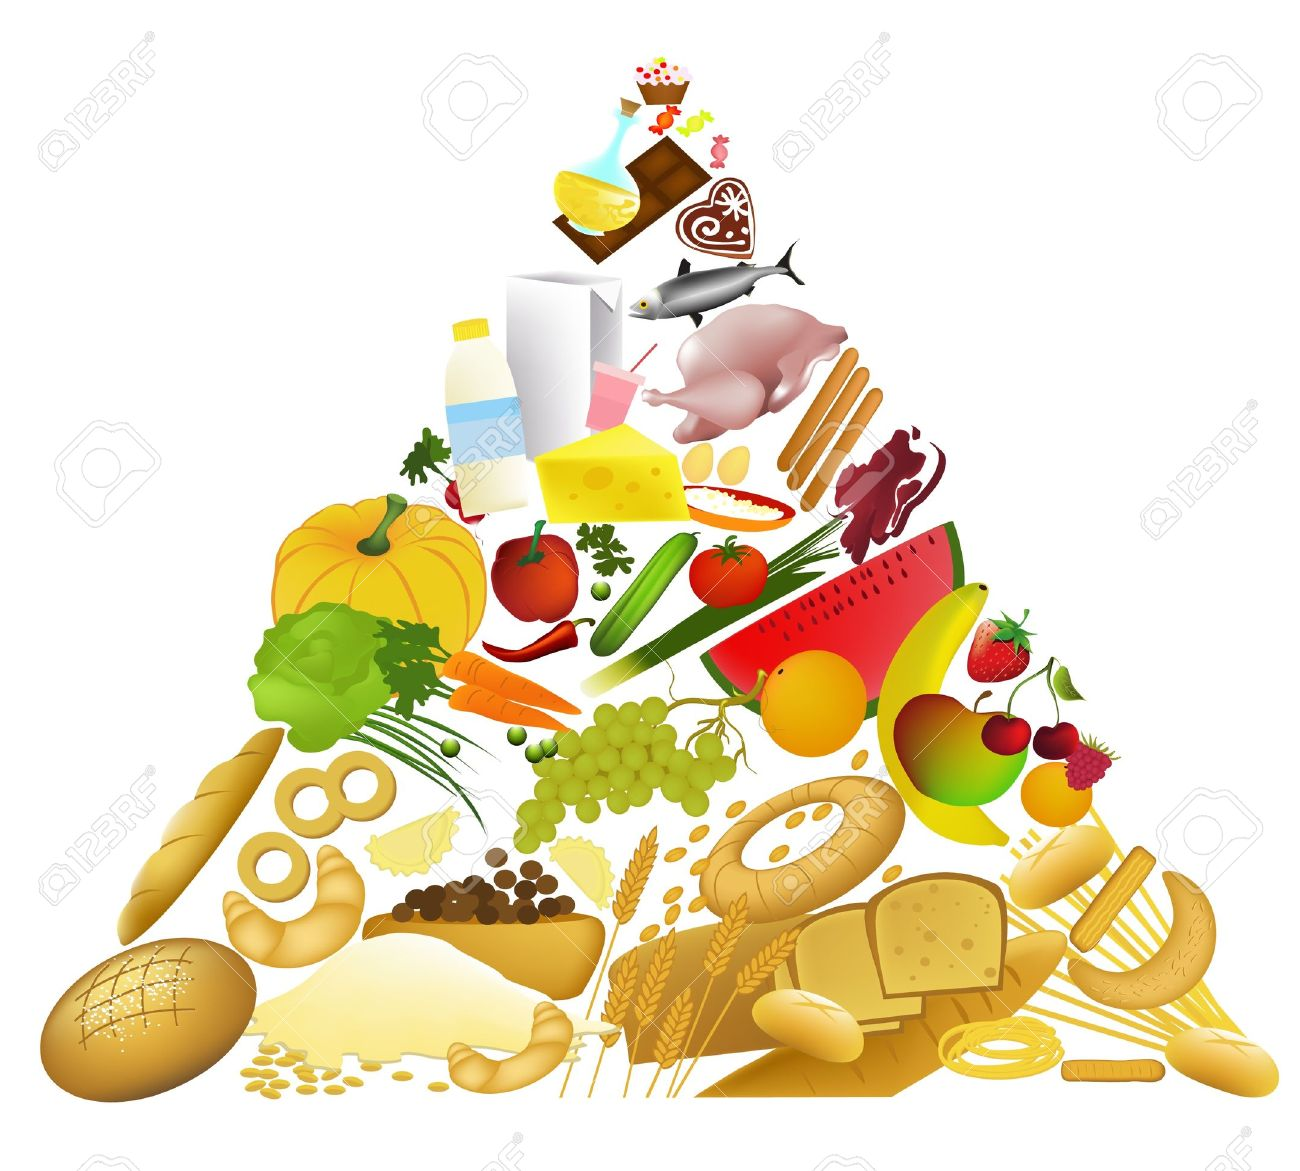 Food Pyramid Stock Vector - 14093983